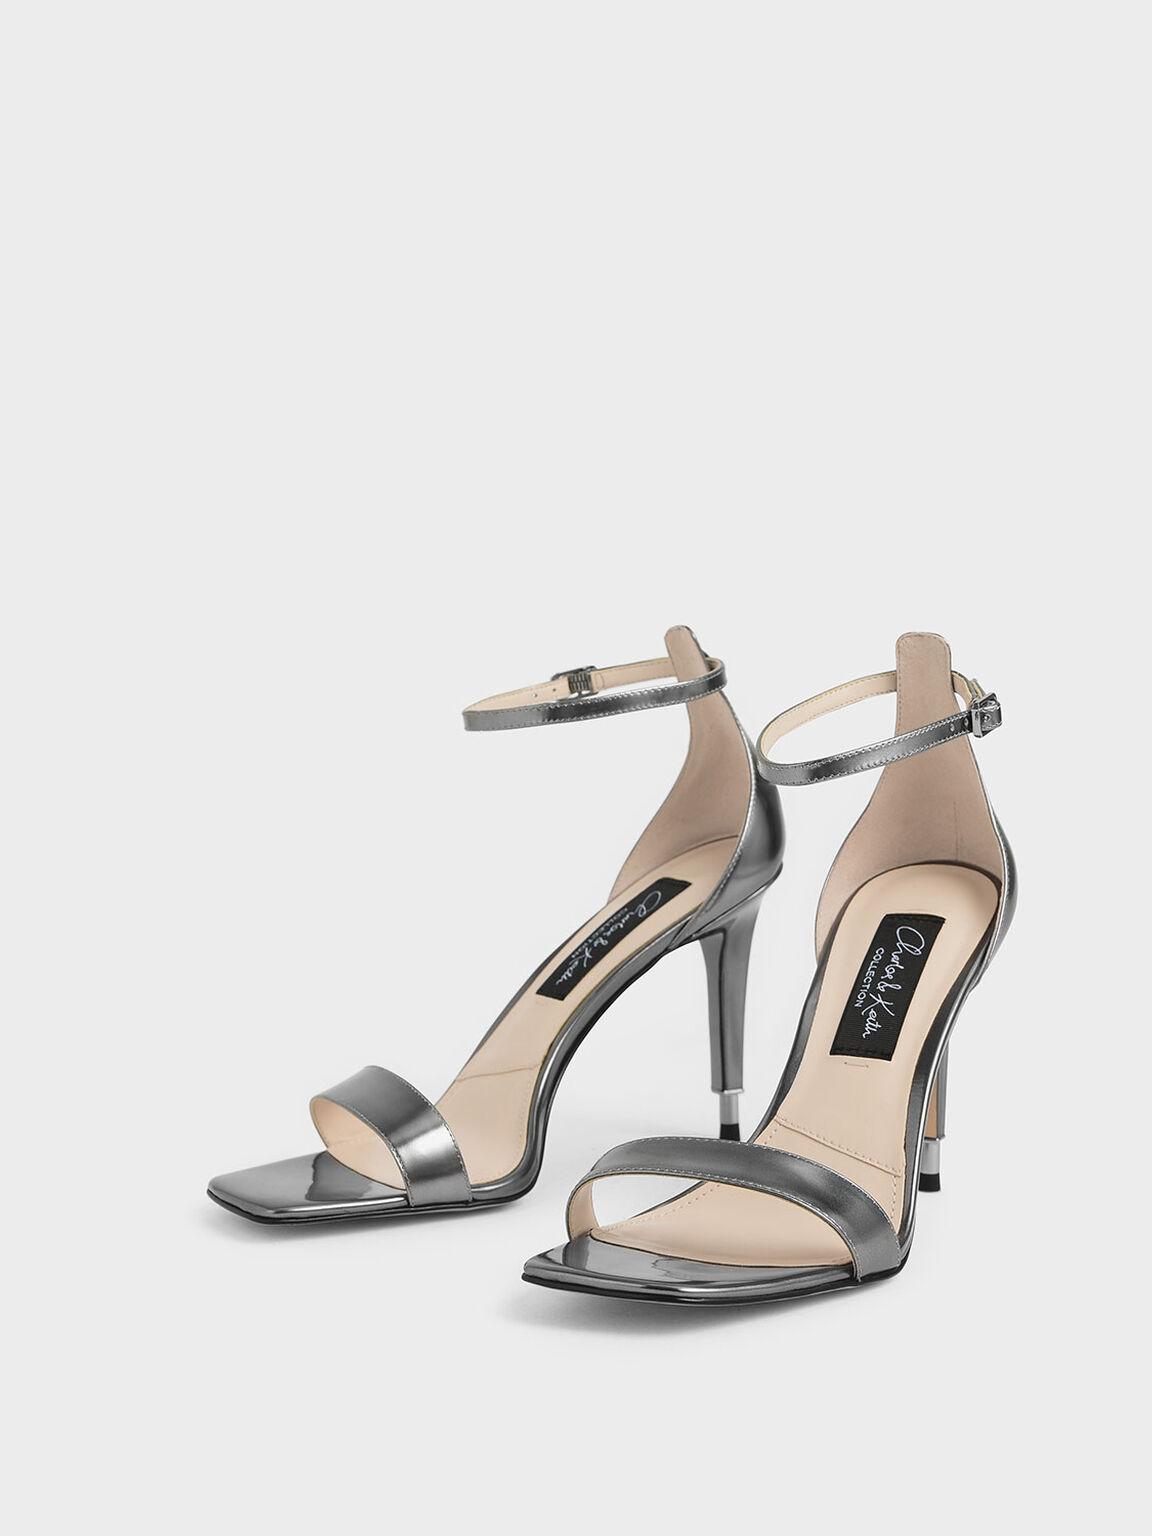 Metallic Leather Stiletto Heels, Silver, hi-res